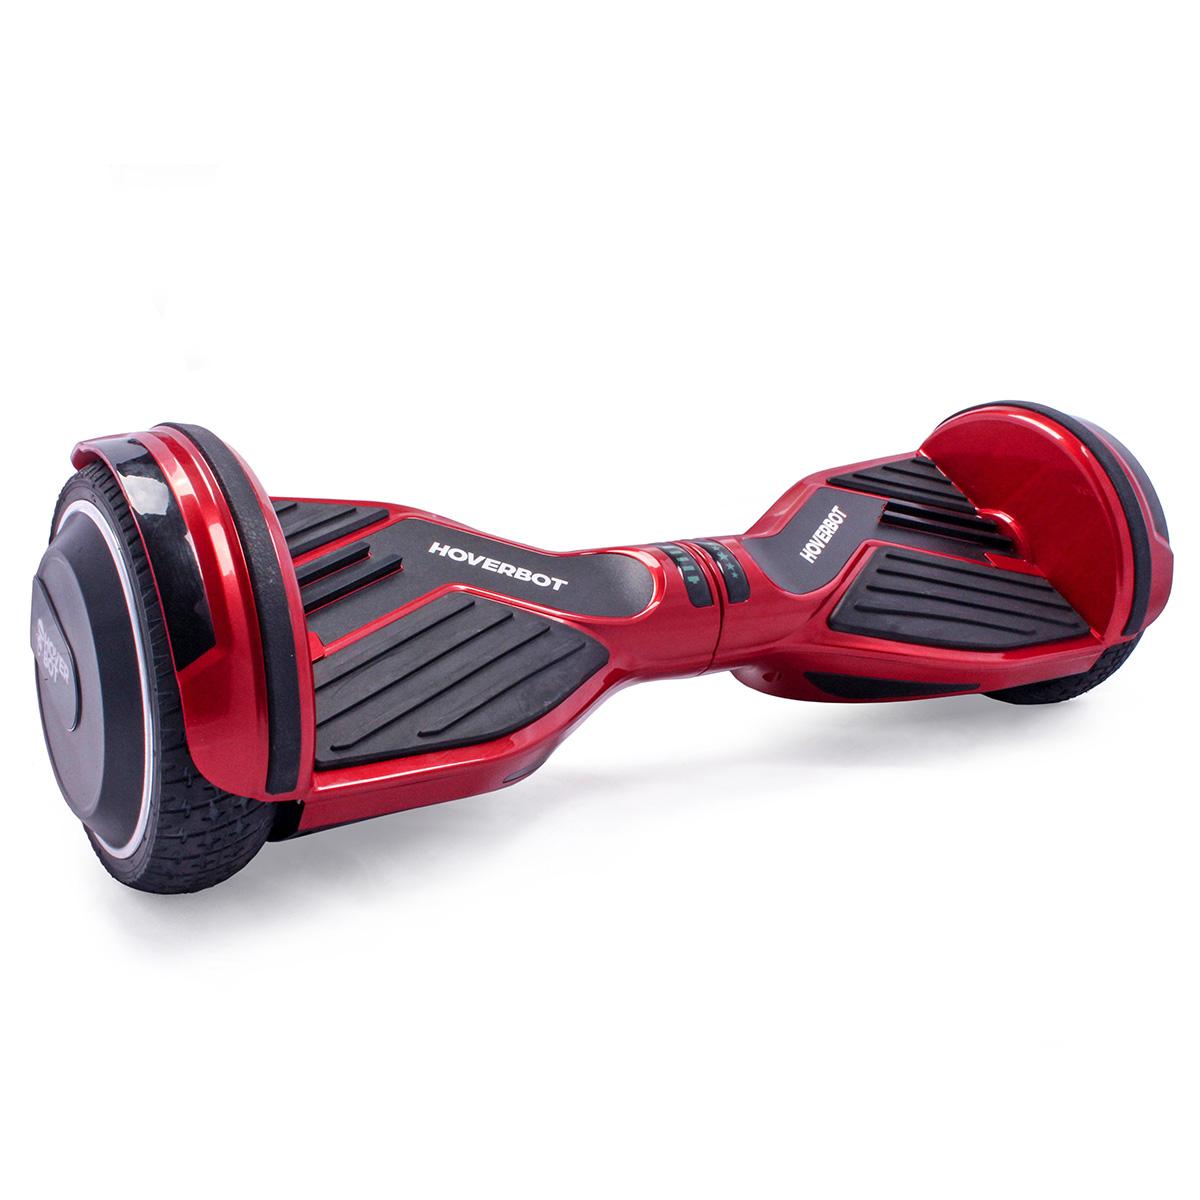 "Гироскутер Hoverbot ""A-6 Premium"", цвет: красный, Hoverbot (Sport)"